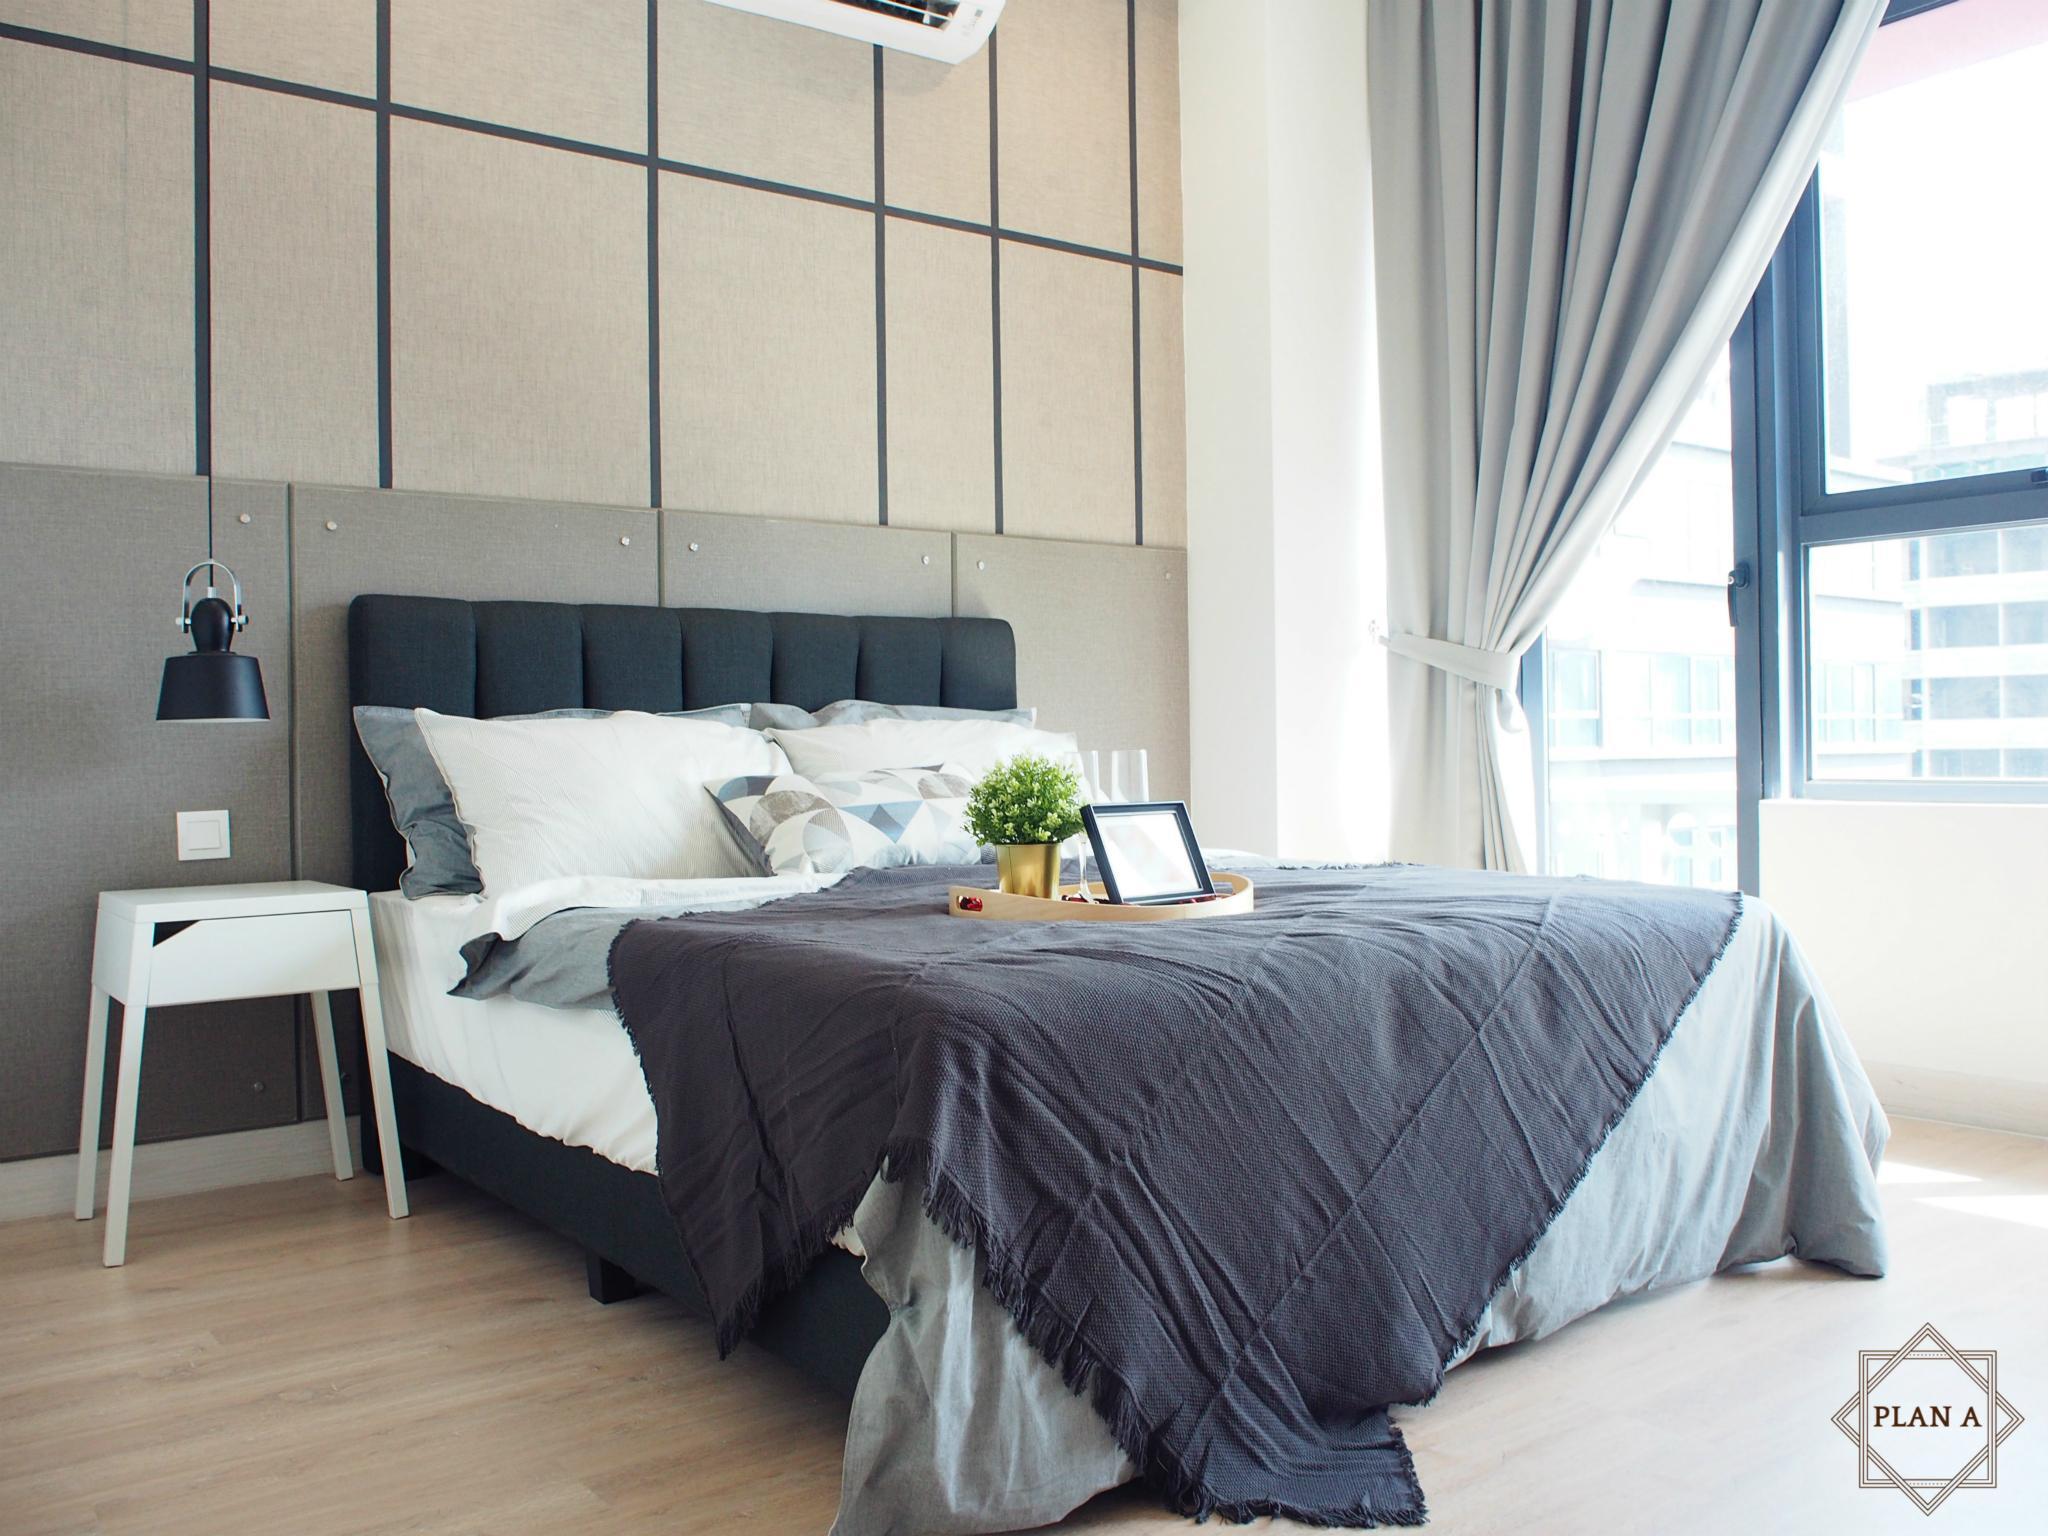 NEW  Signature 3 Beds@Arte+ Kuala Lumpur  PlanA